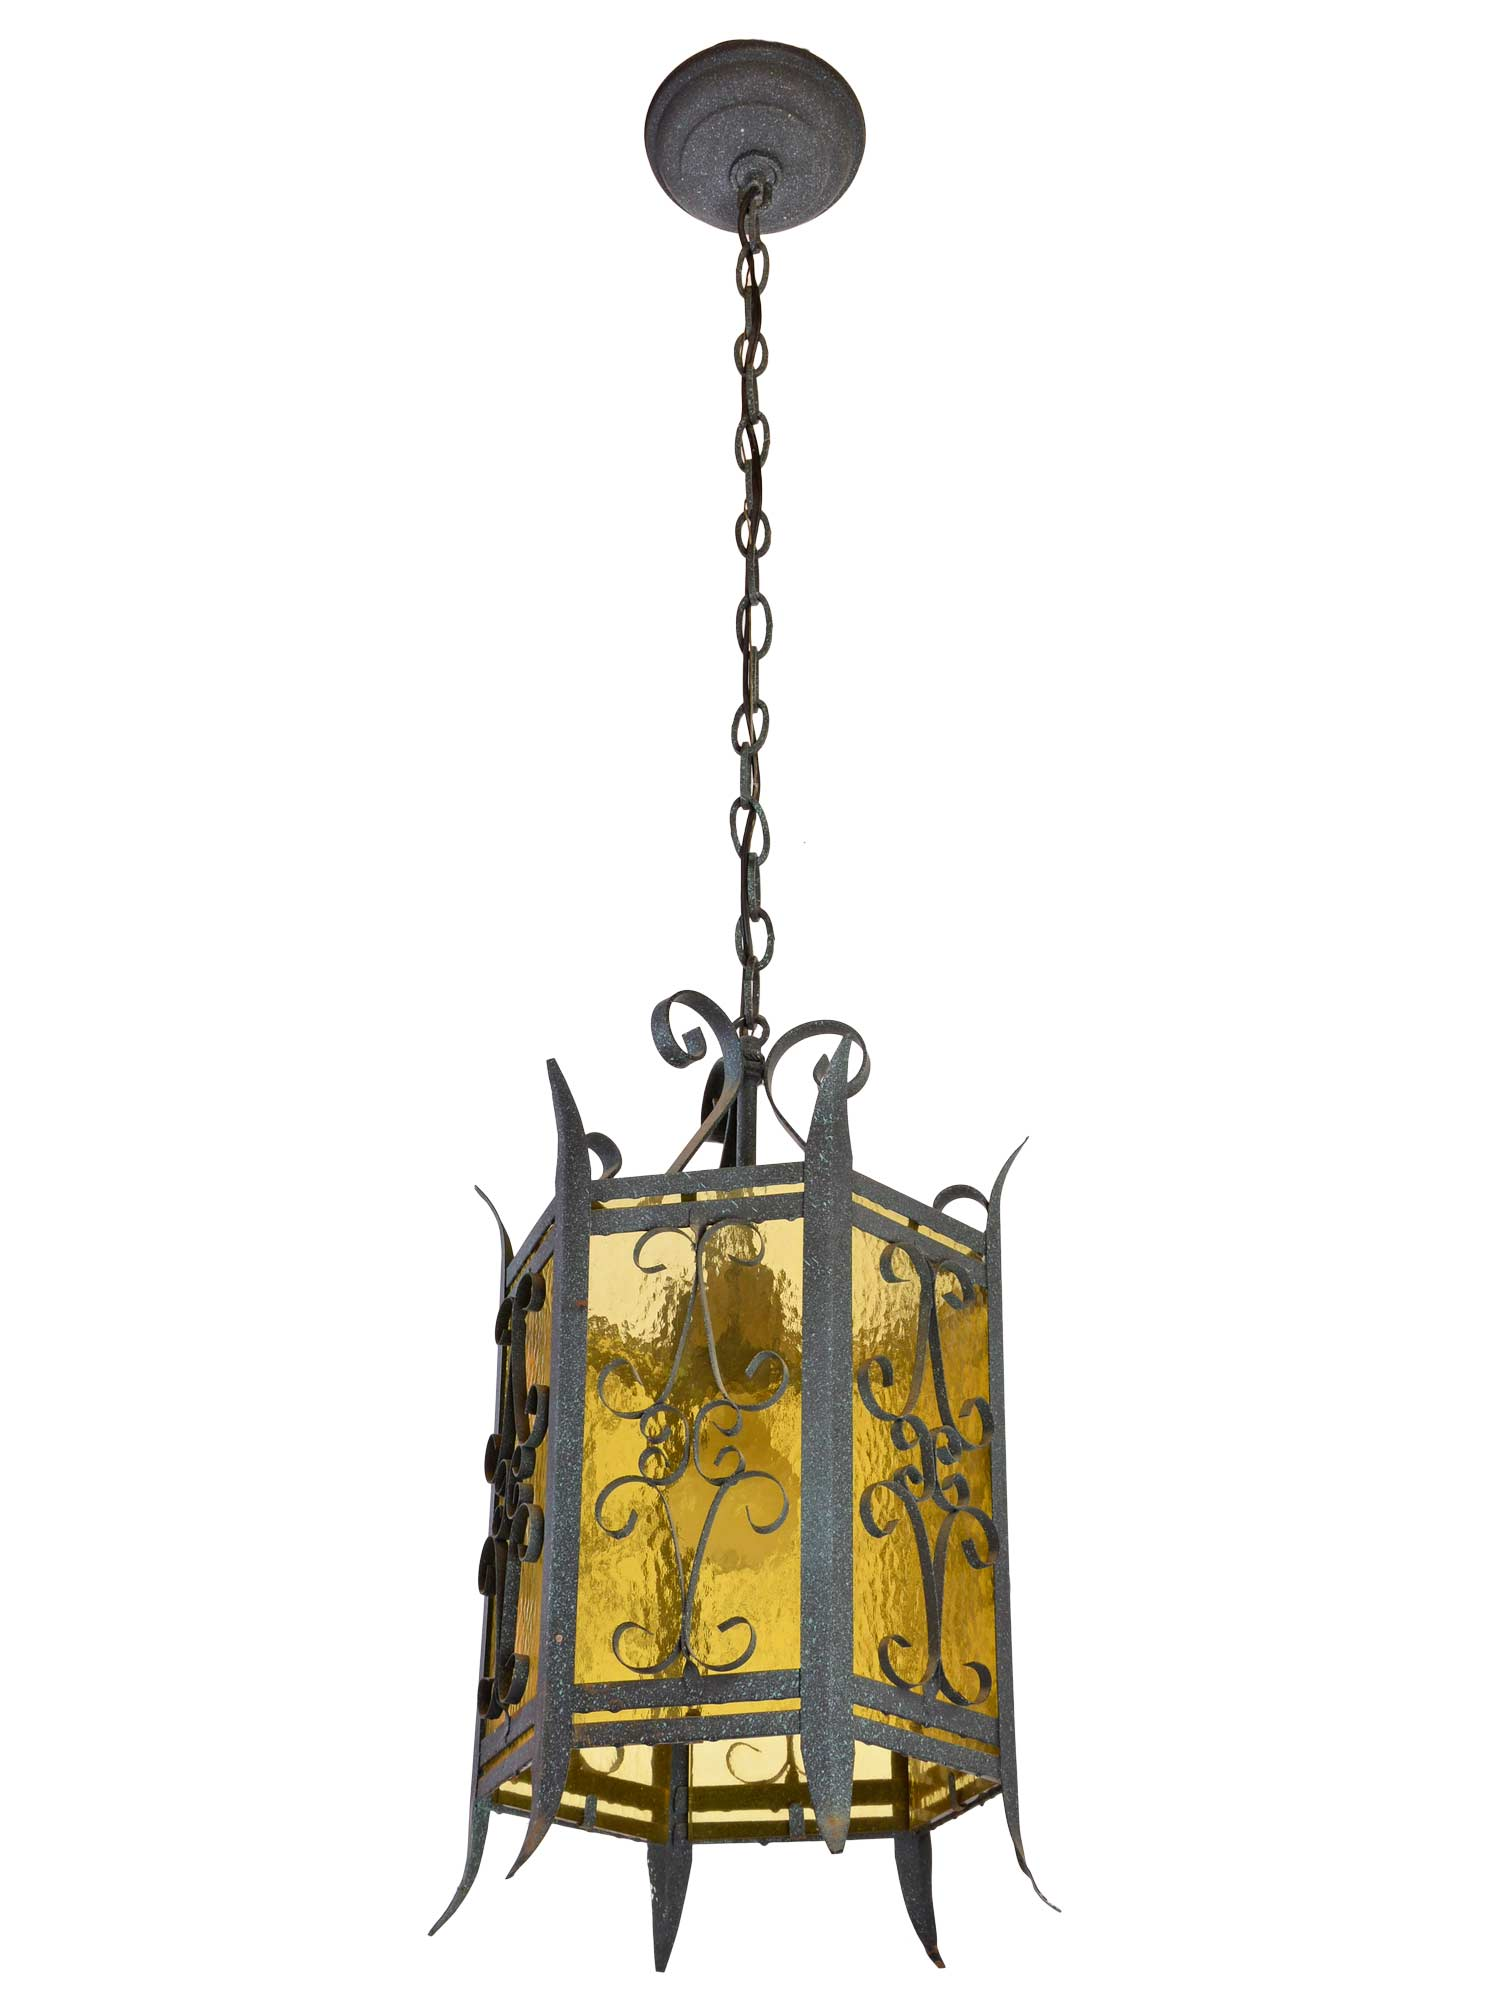 46371-steel-and-amber-glass-pendant-lantern-angle.jpg